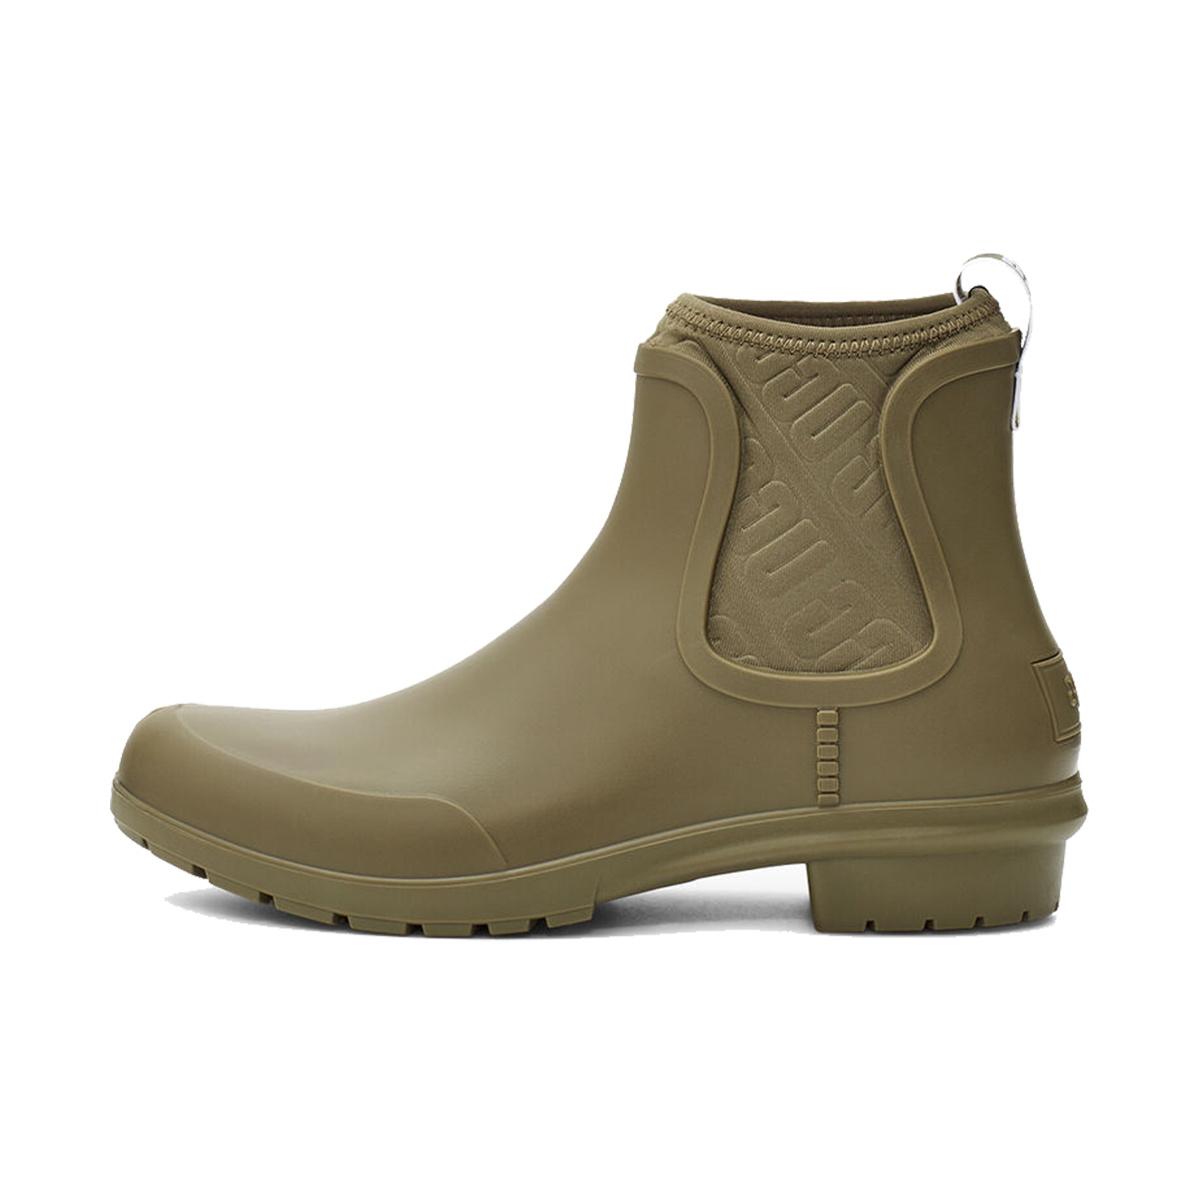 UGG Chevonne Rainboot Womens (Olive) 1110650